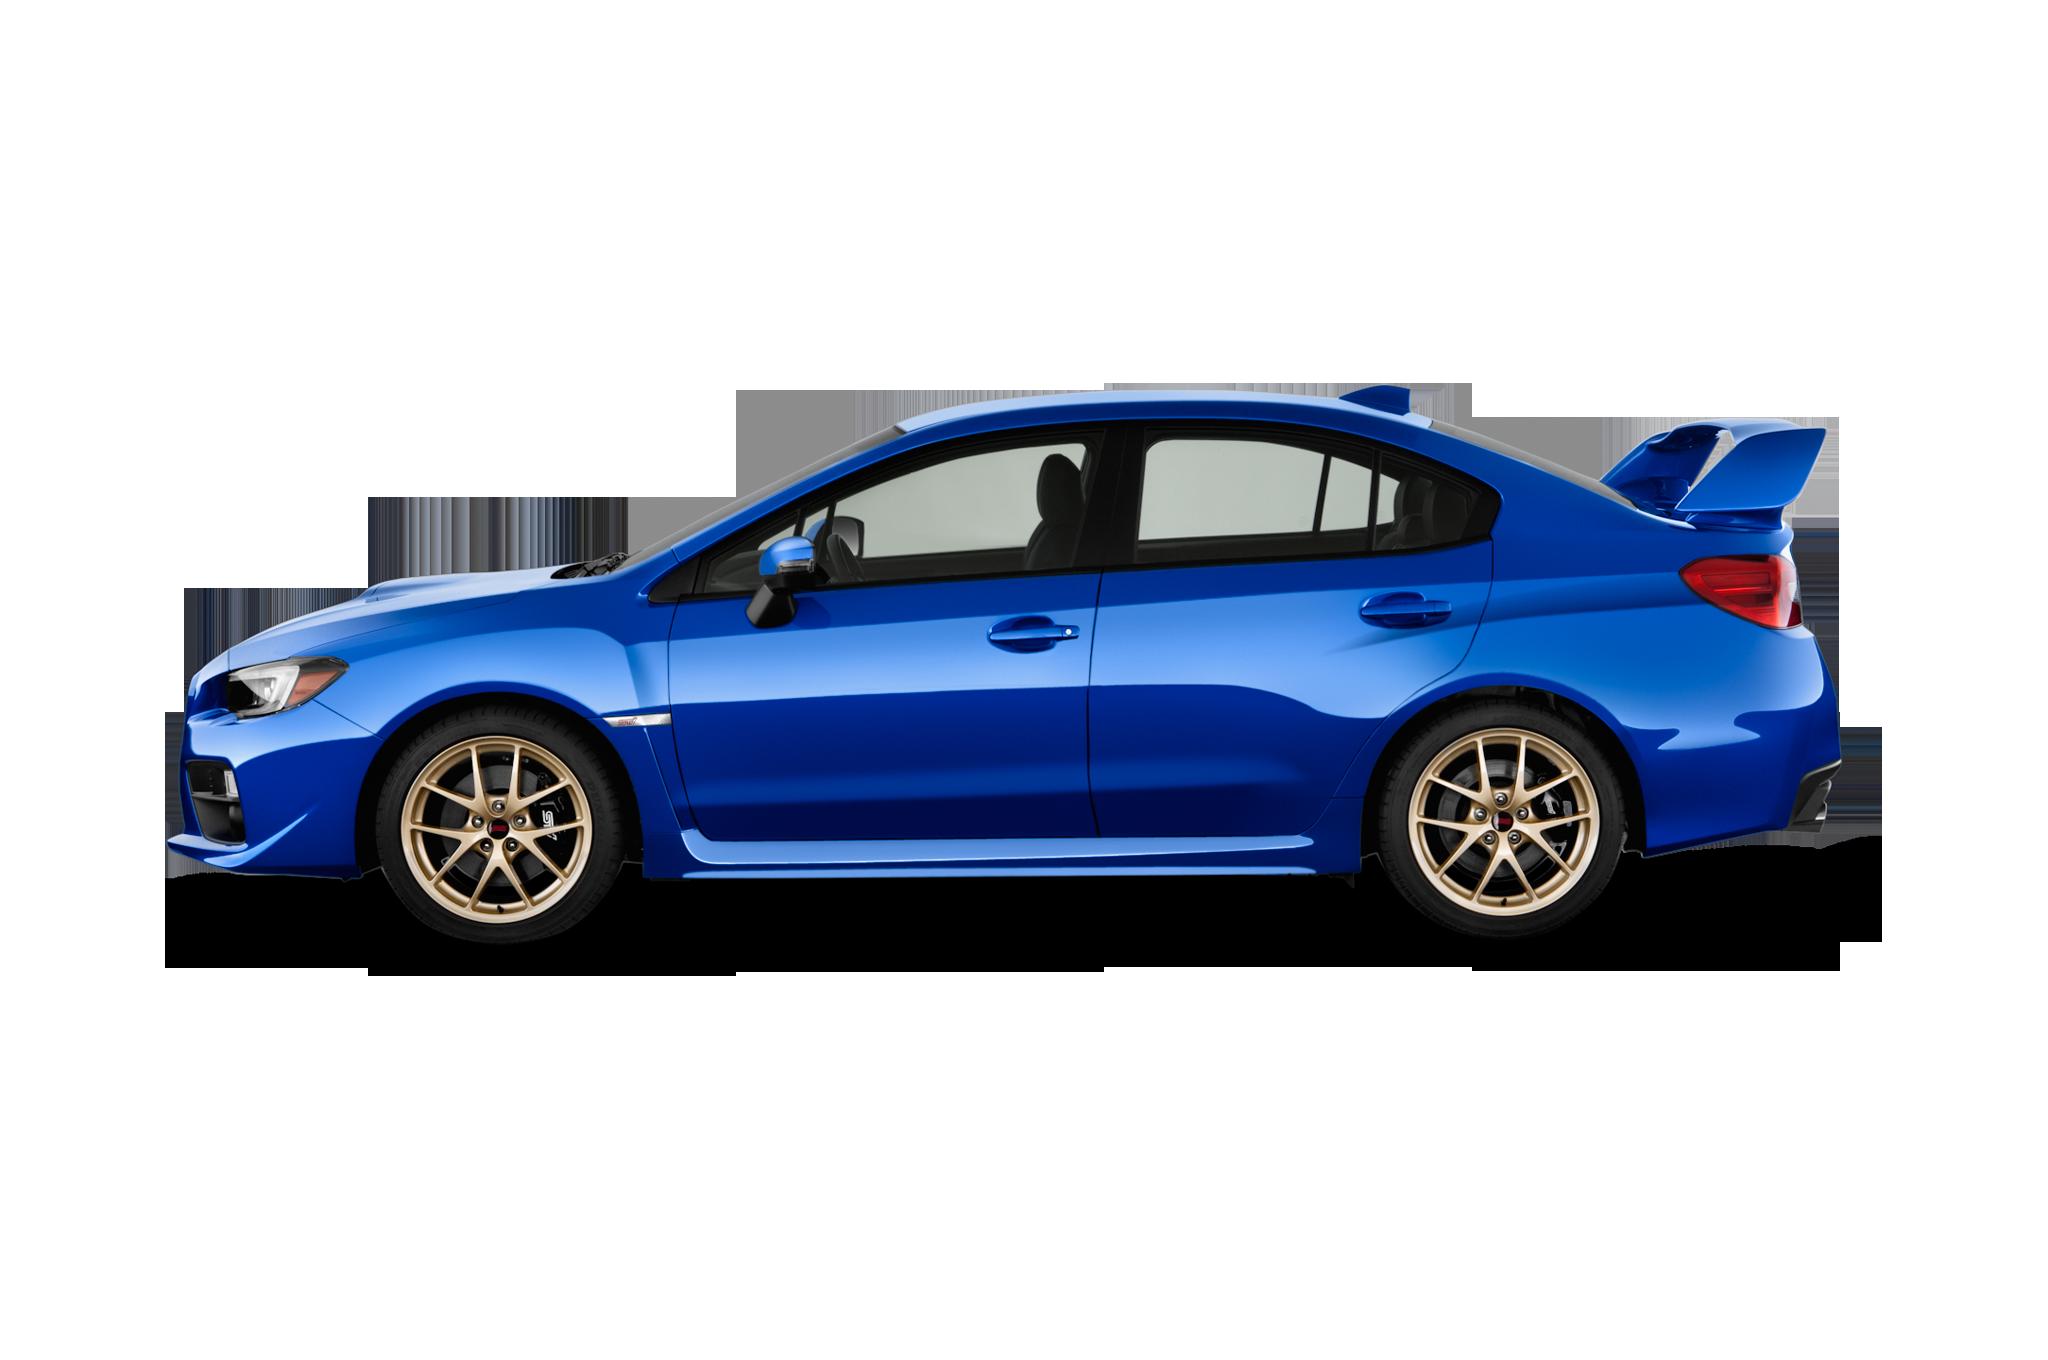 2018 Subaru Crosstrek Mpg >> 2017 Subaru WRX, WRX STI, 2016 Subaru Crosstrek SE Priced | Automobile Magazine